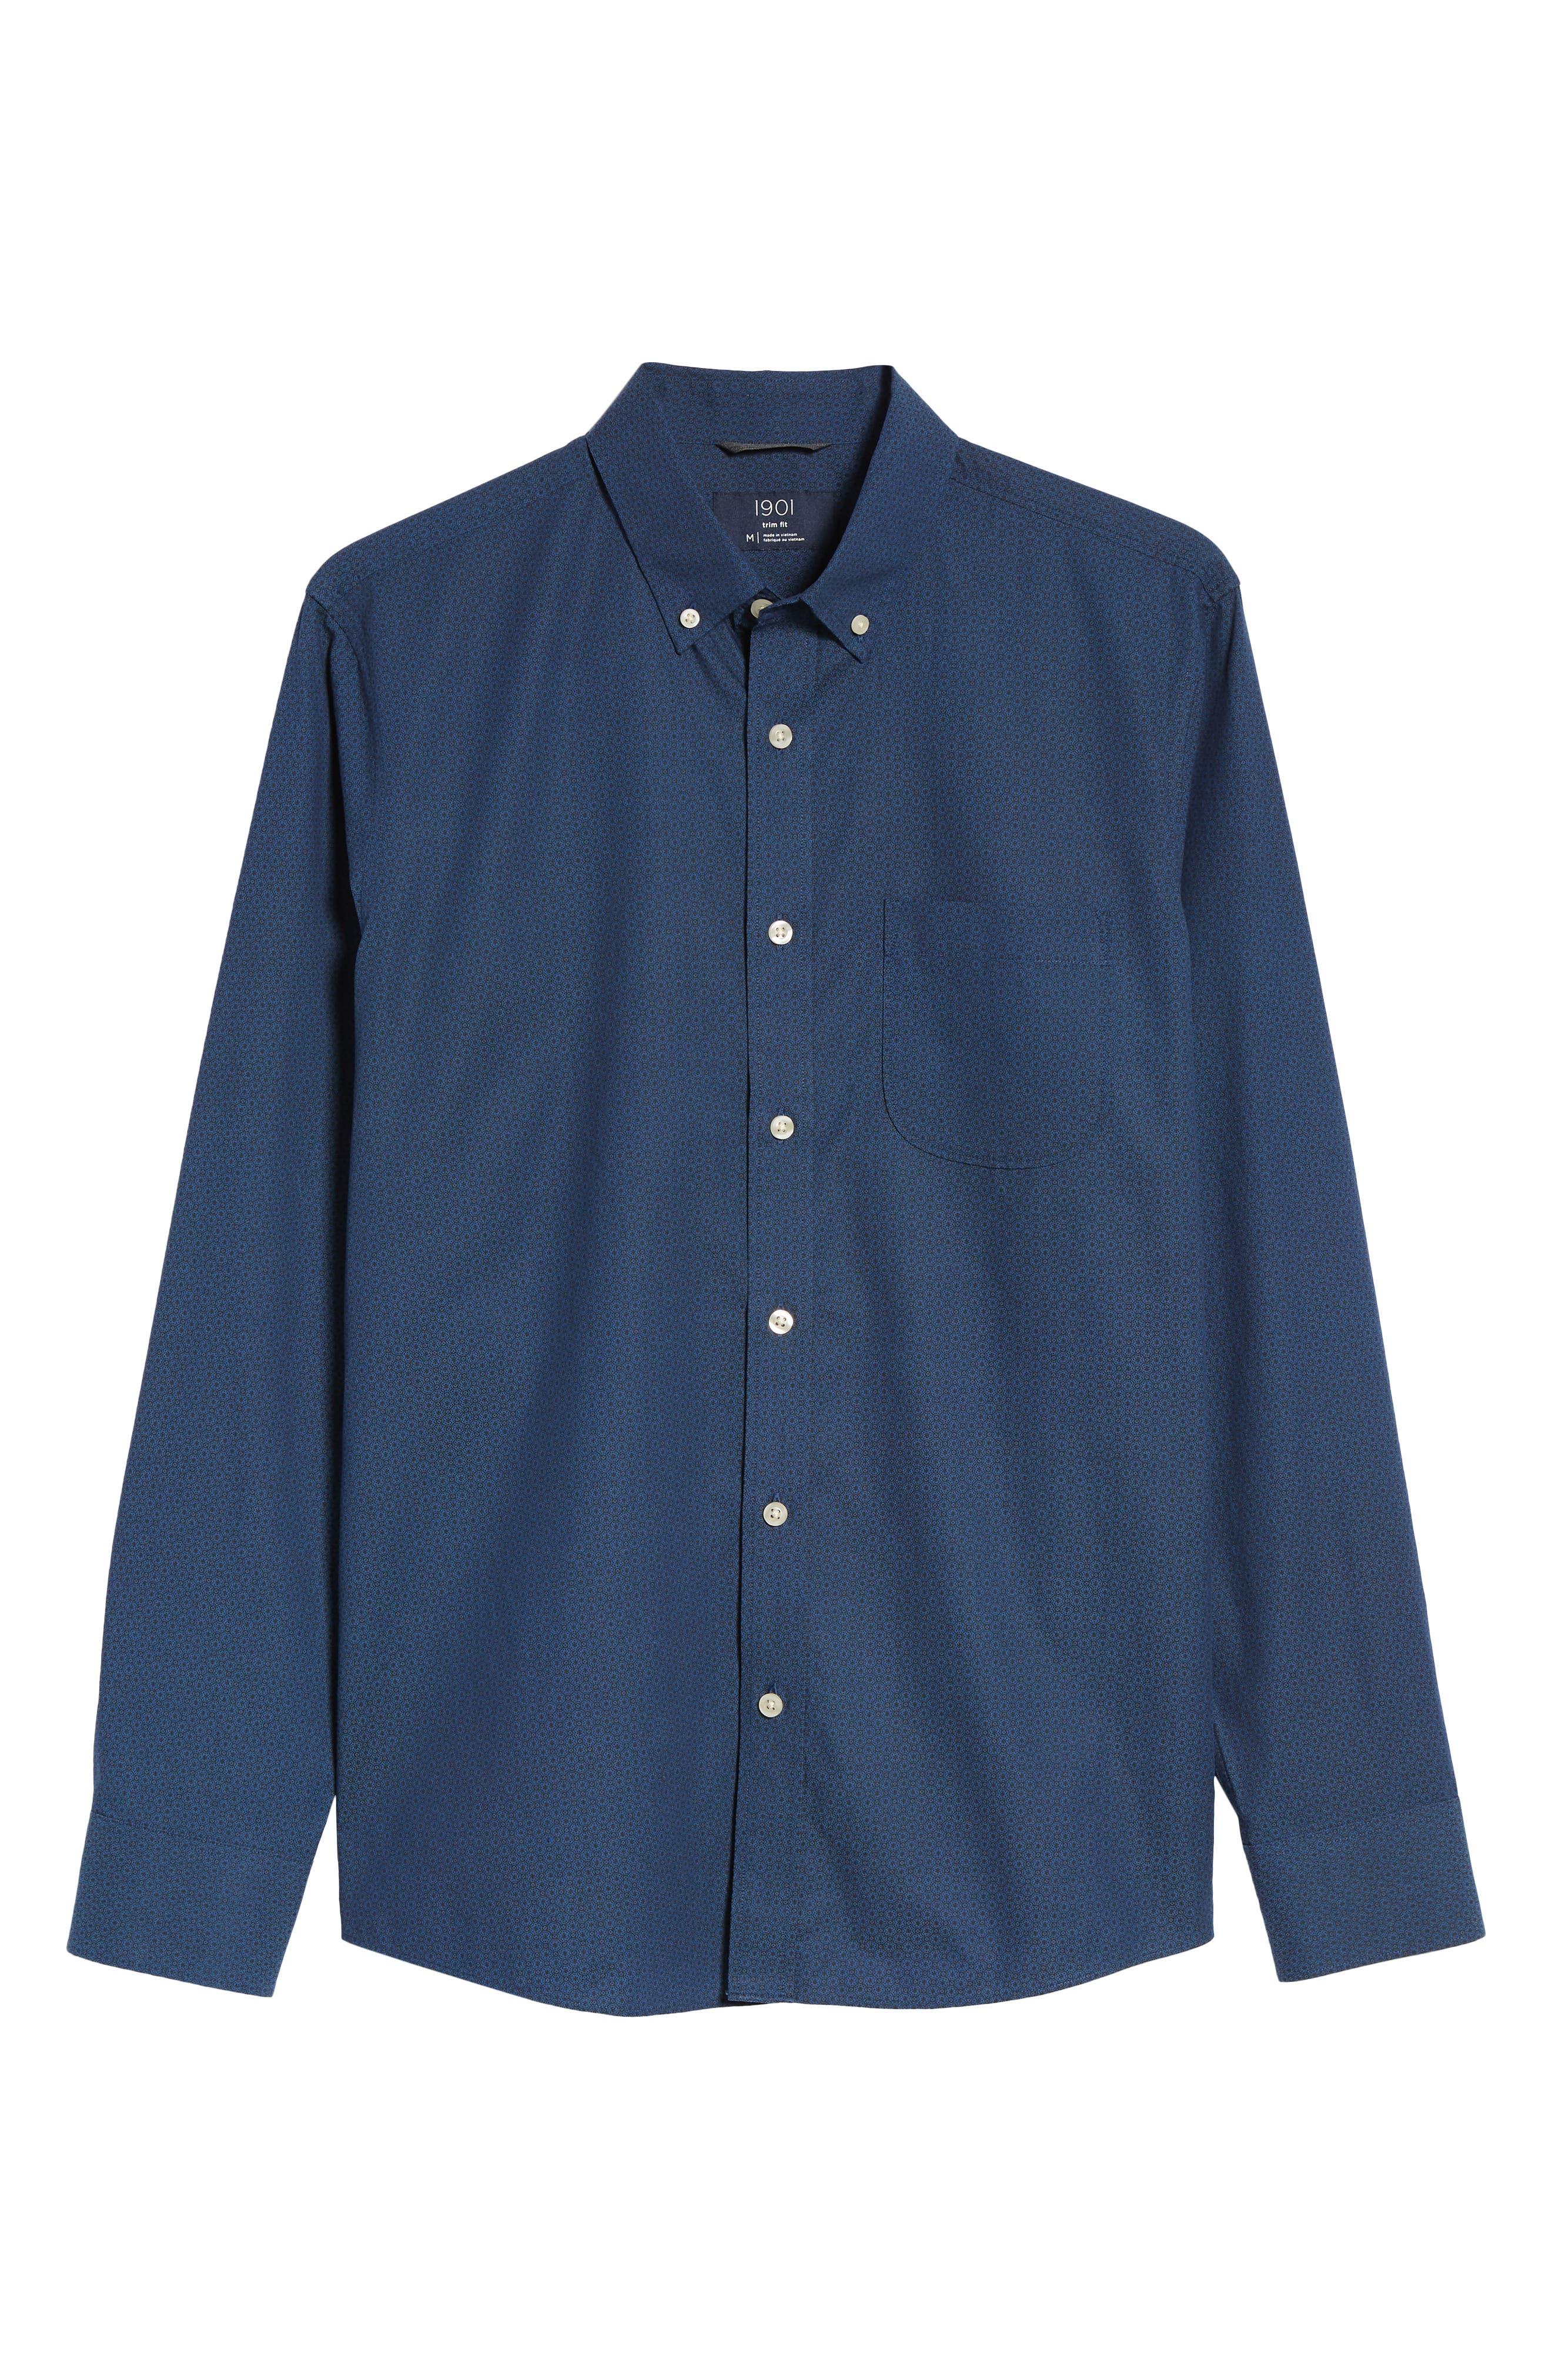 Trim Fit Round Pocket Sport Shirt,                             Alternate thumbnail 6, color,                             Blue Black Flower Print